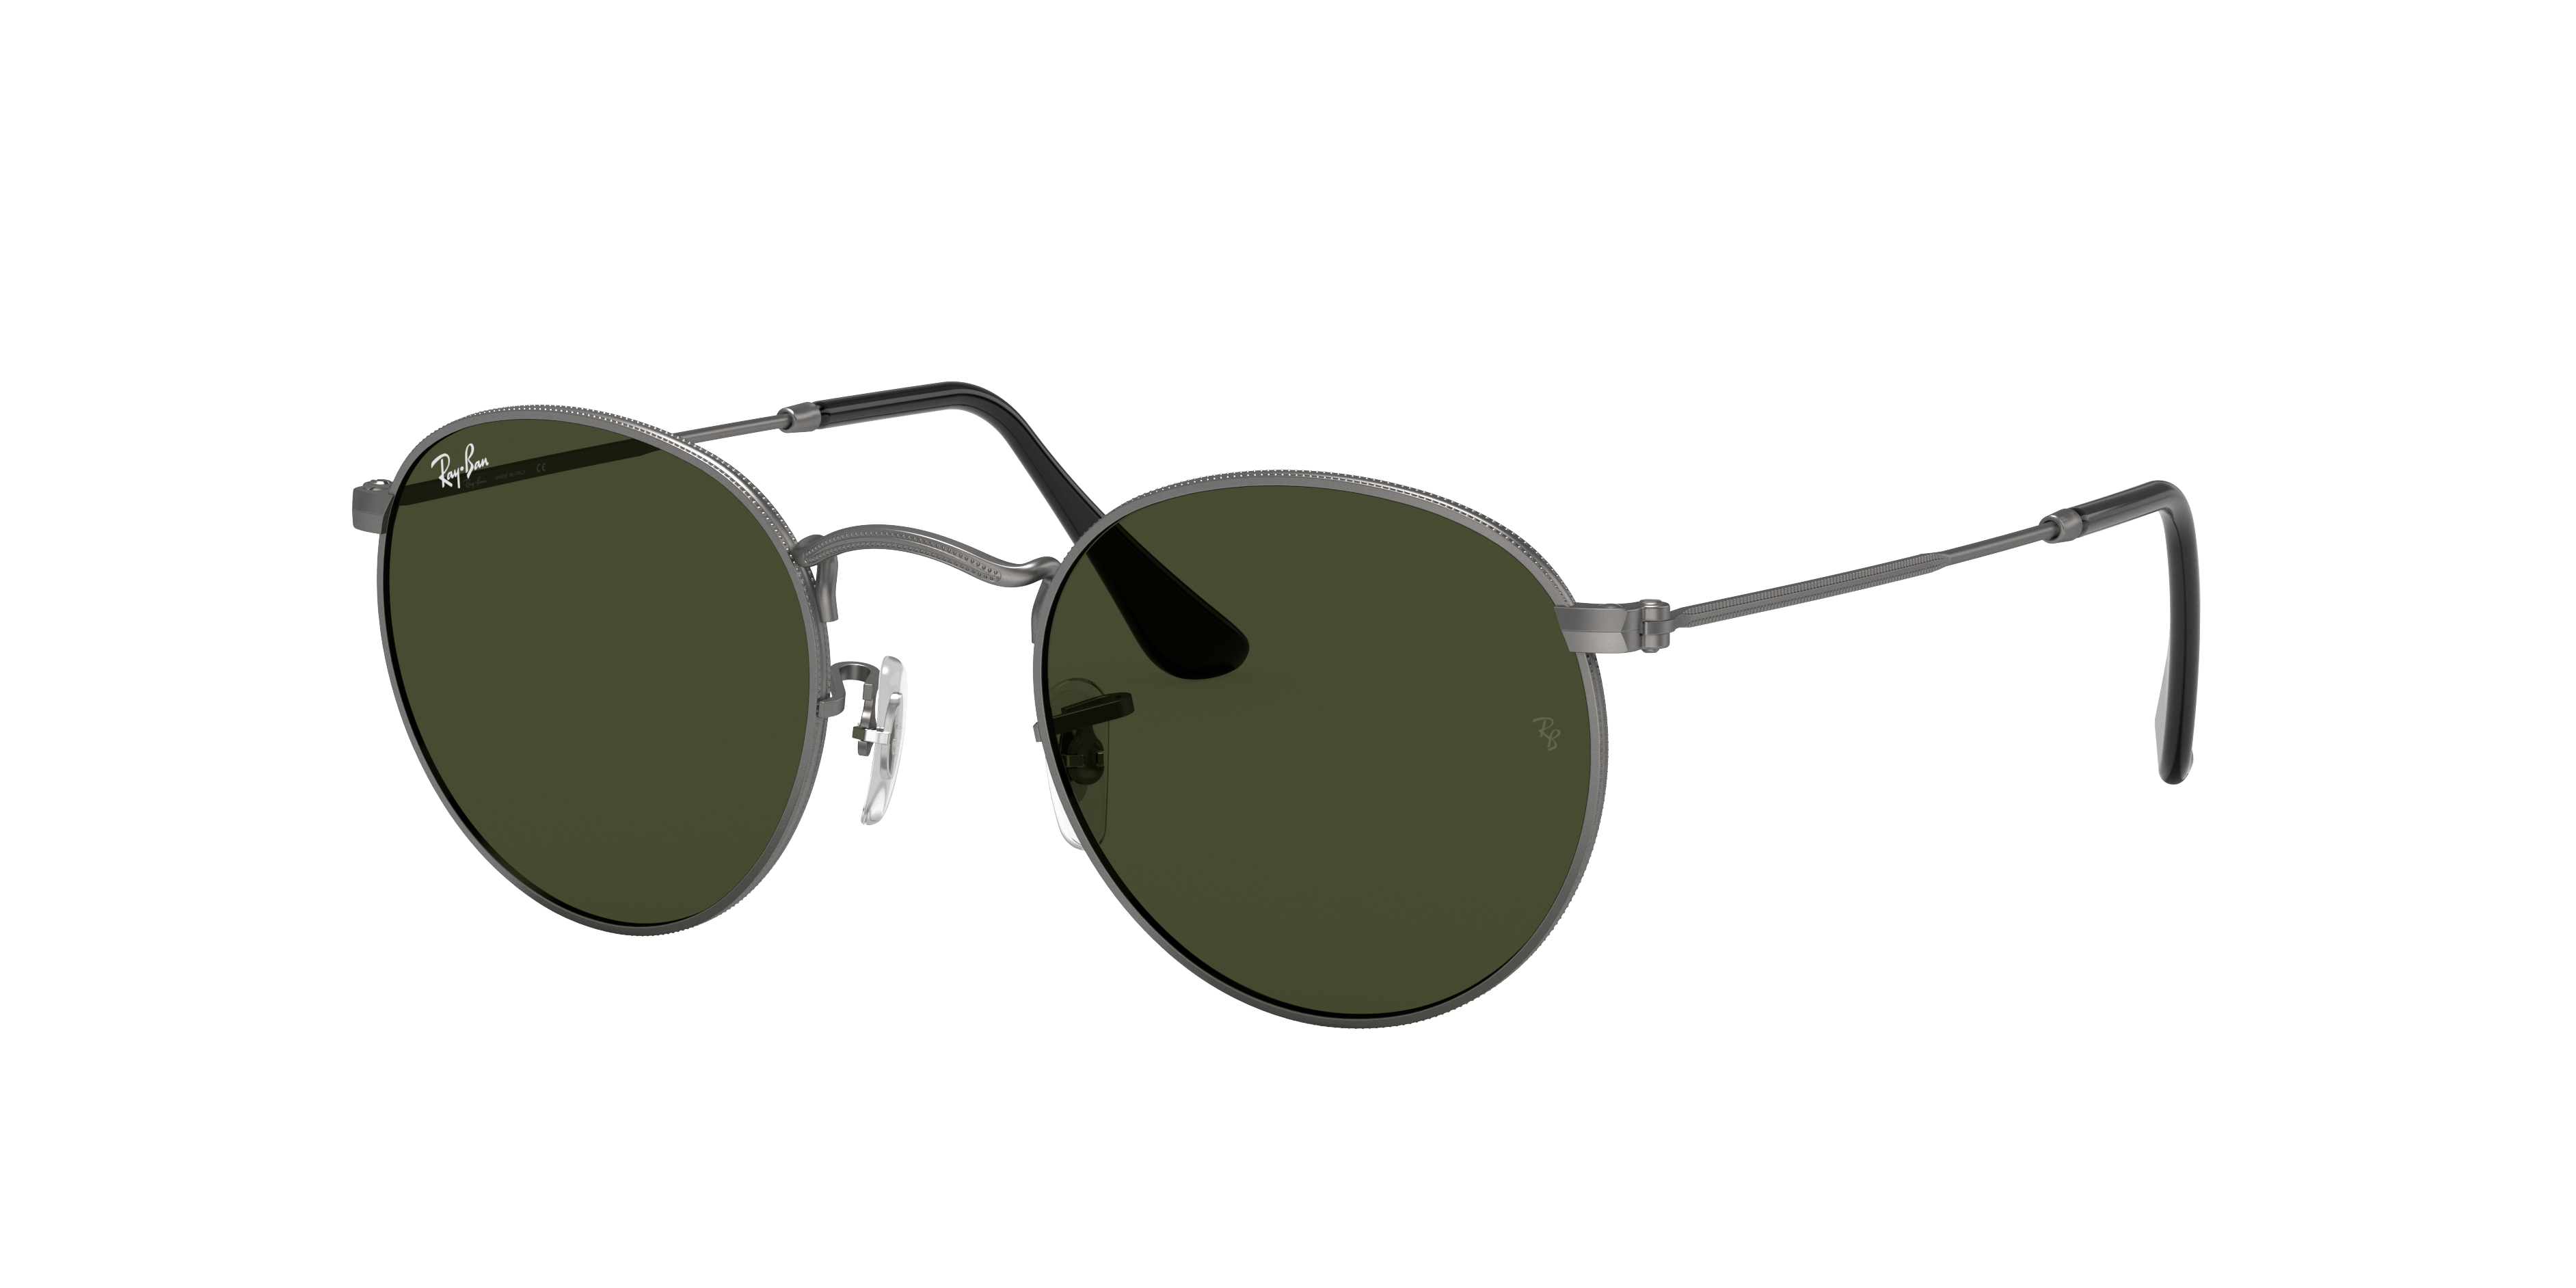 Ray-Ban Round Metal Gunmetal, Green Lenses - RB3447